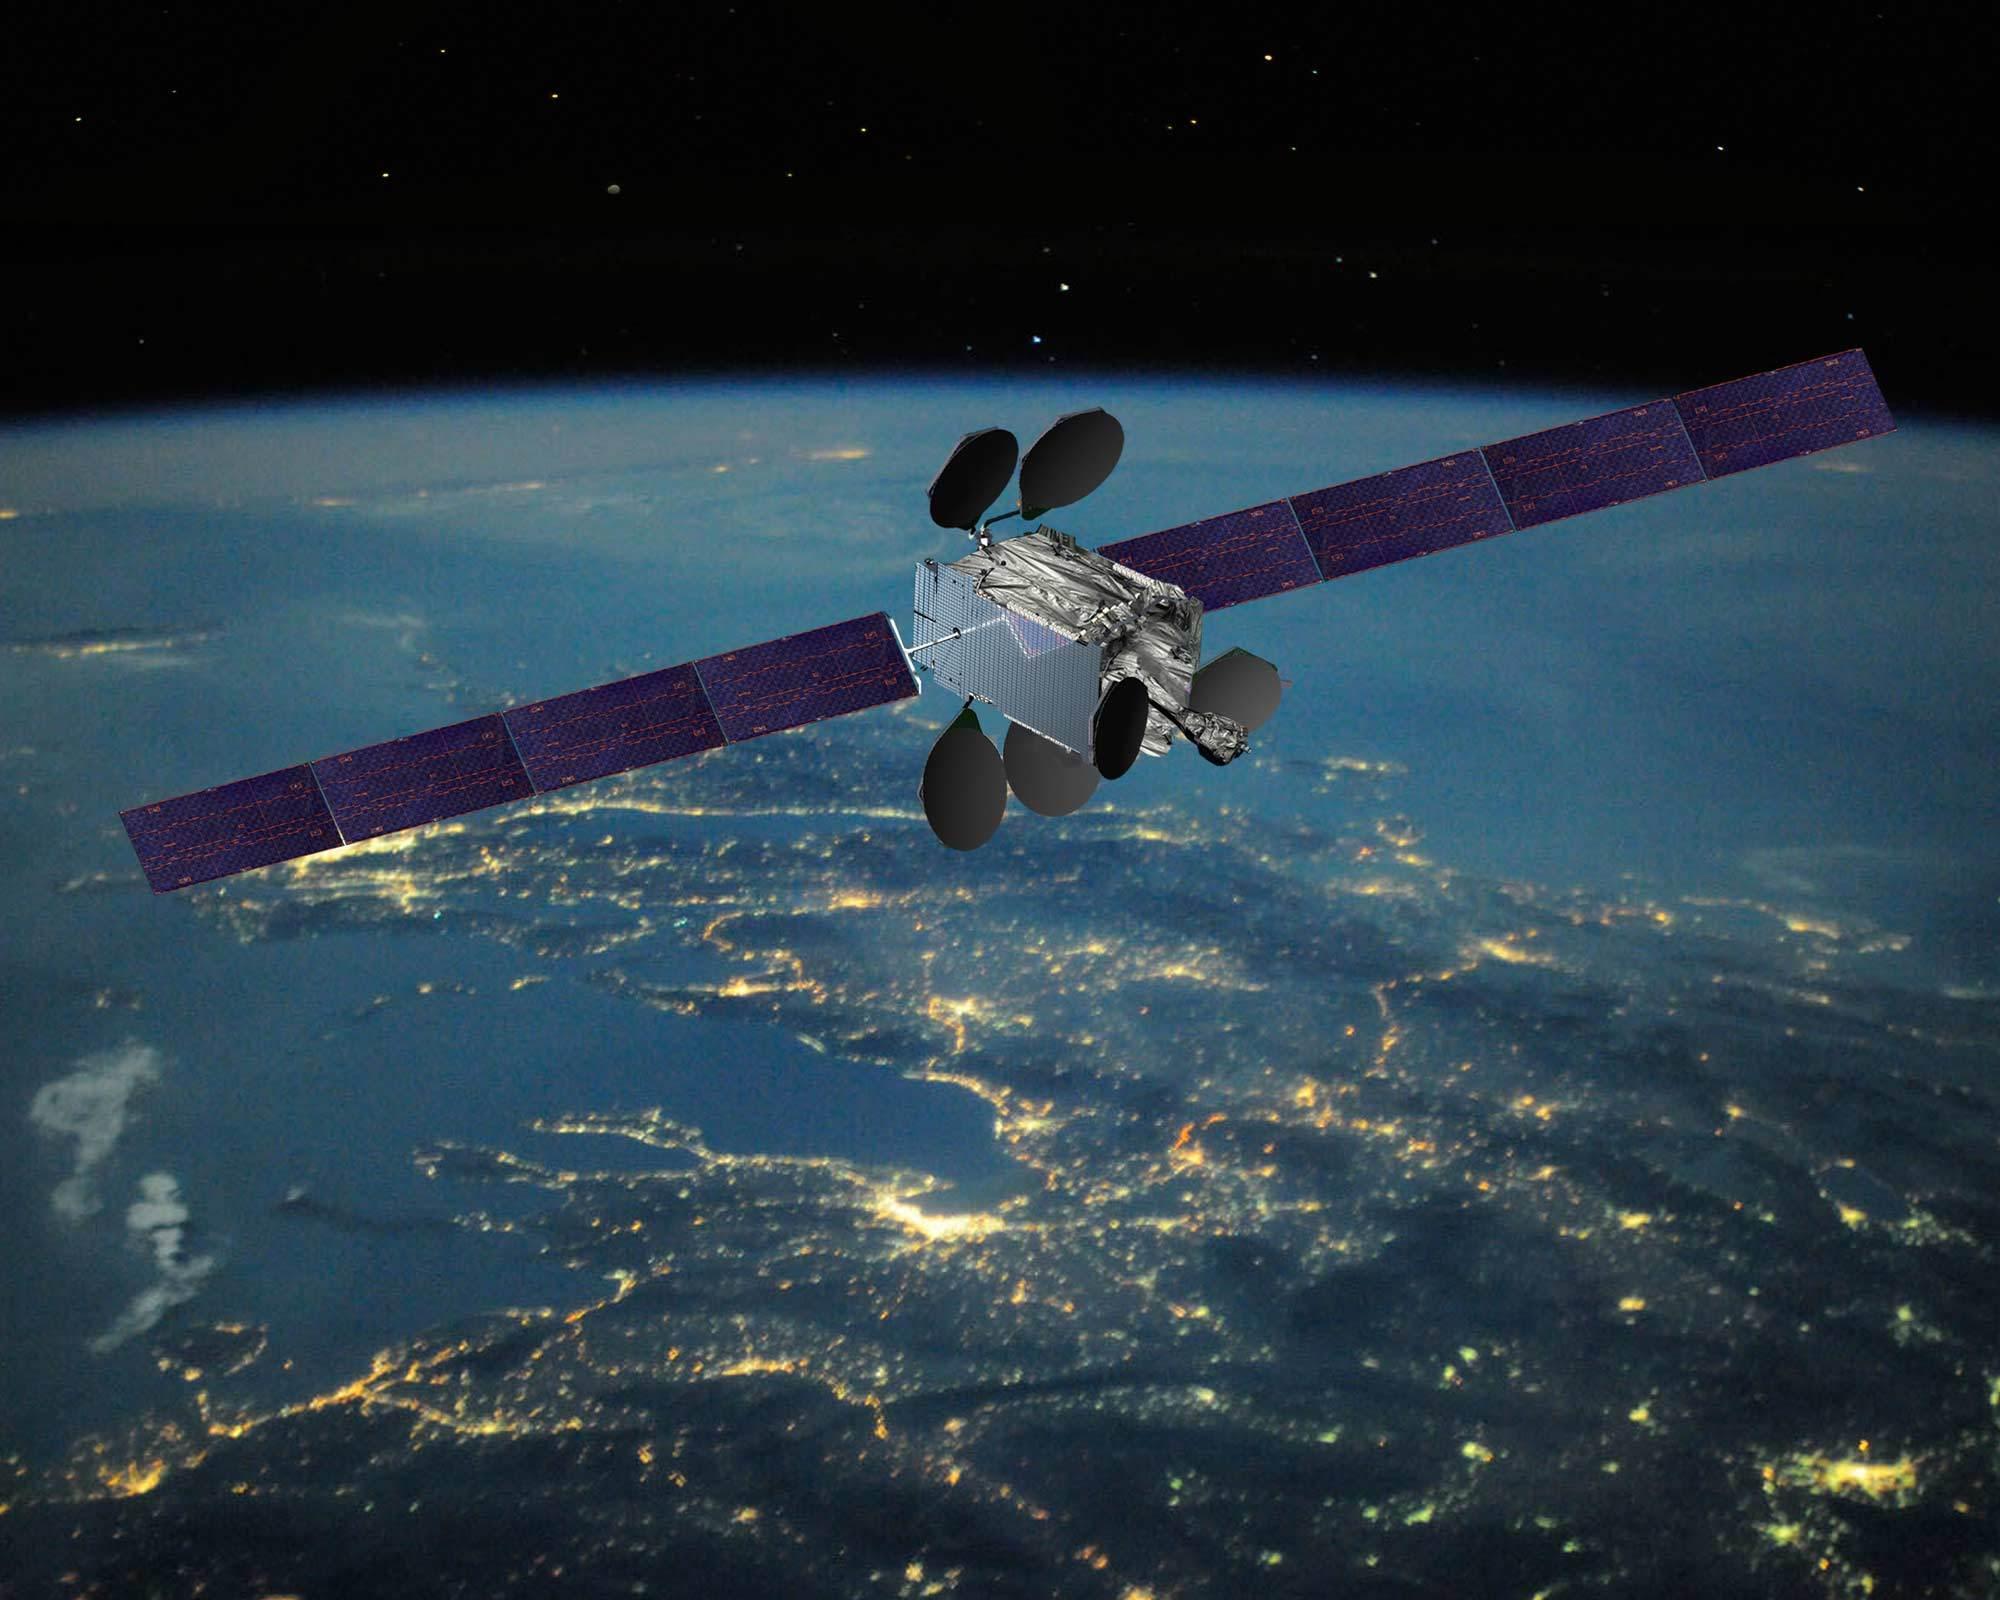 Intelsat and Telenor Satellite expand 4K UHD TV